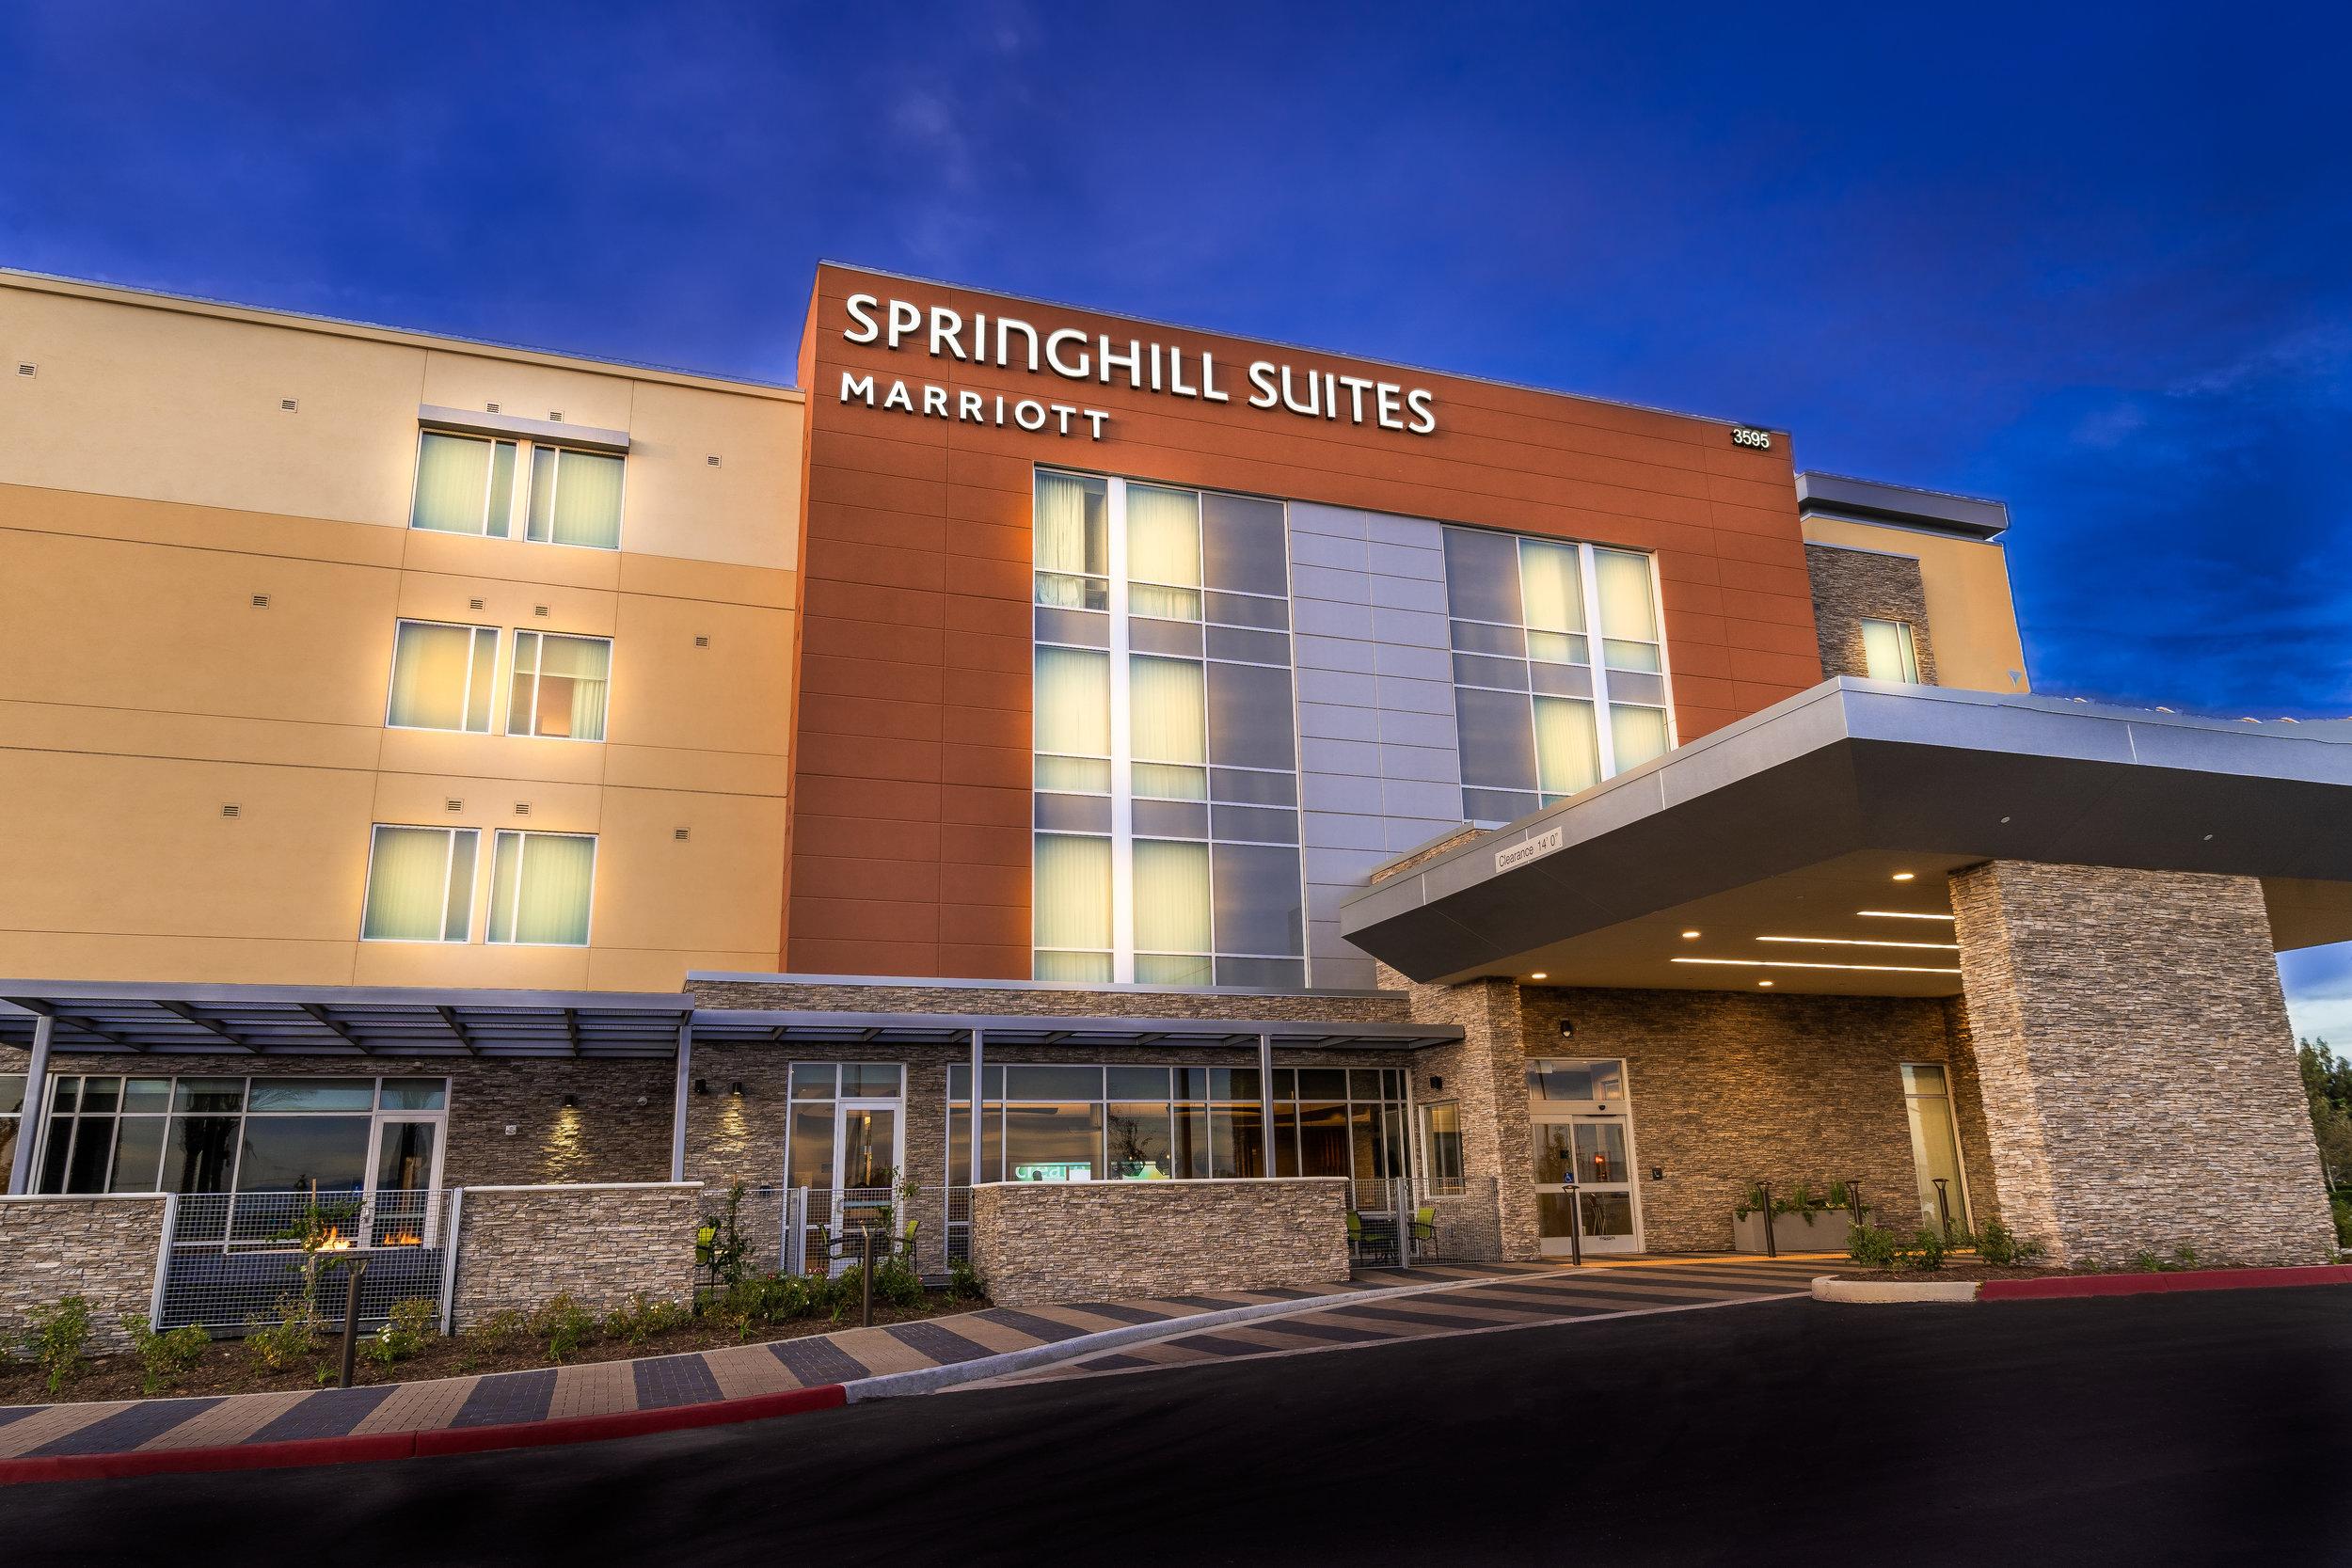 ontario-springhill-suites-exterior-night-FINAL.jpg